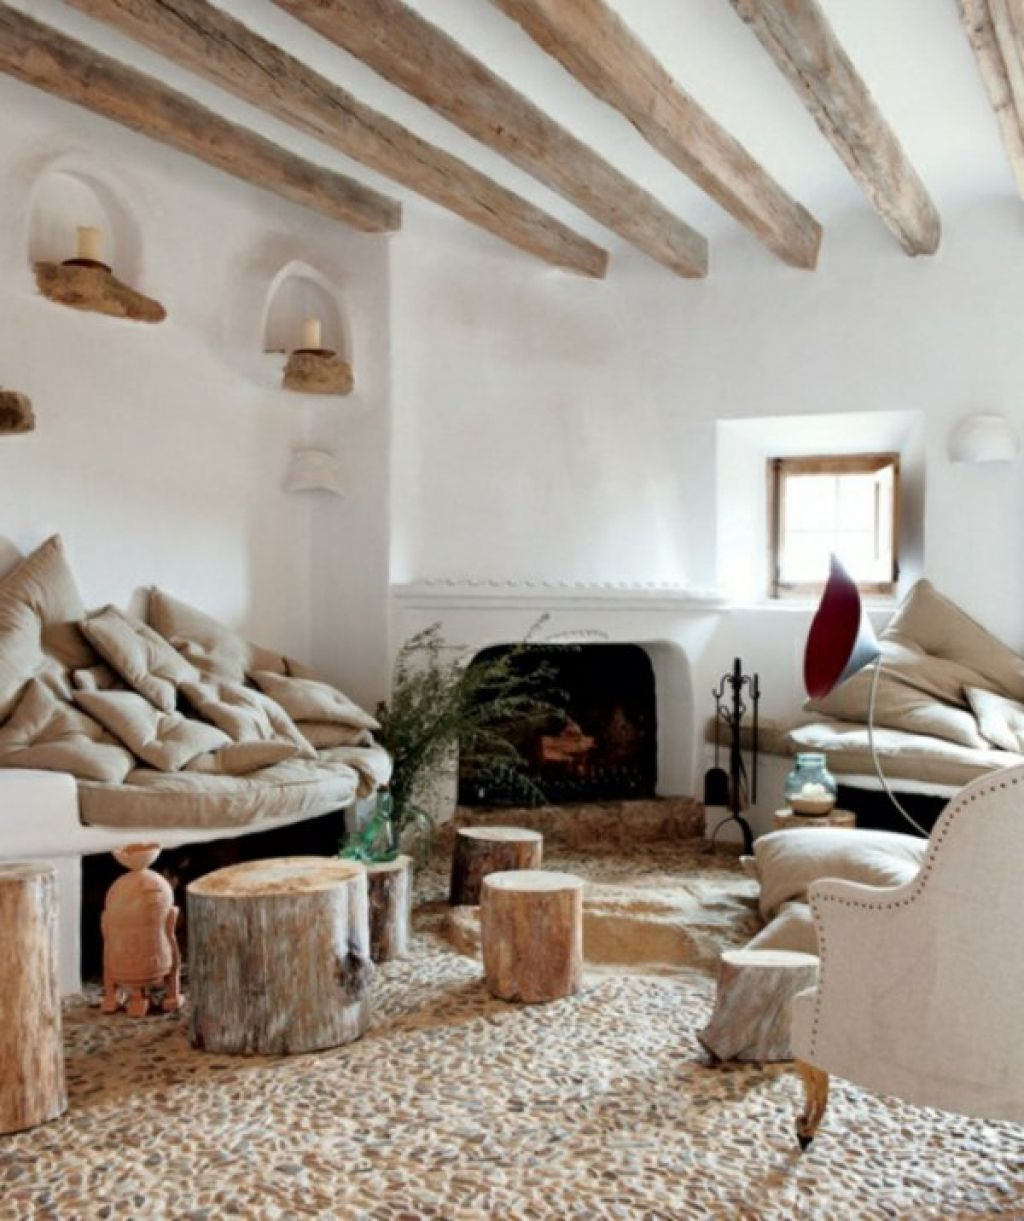 dekoideen wohnzimmer selber machen 21 kreative deko ideen aus ...